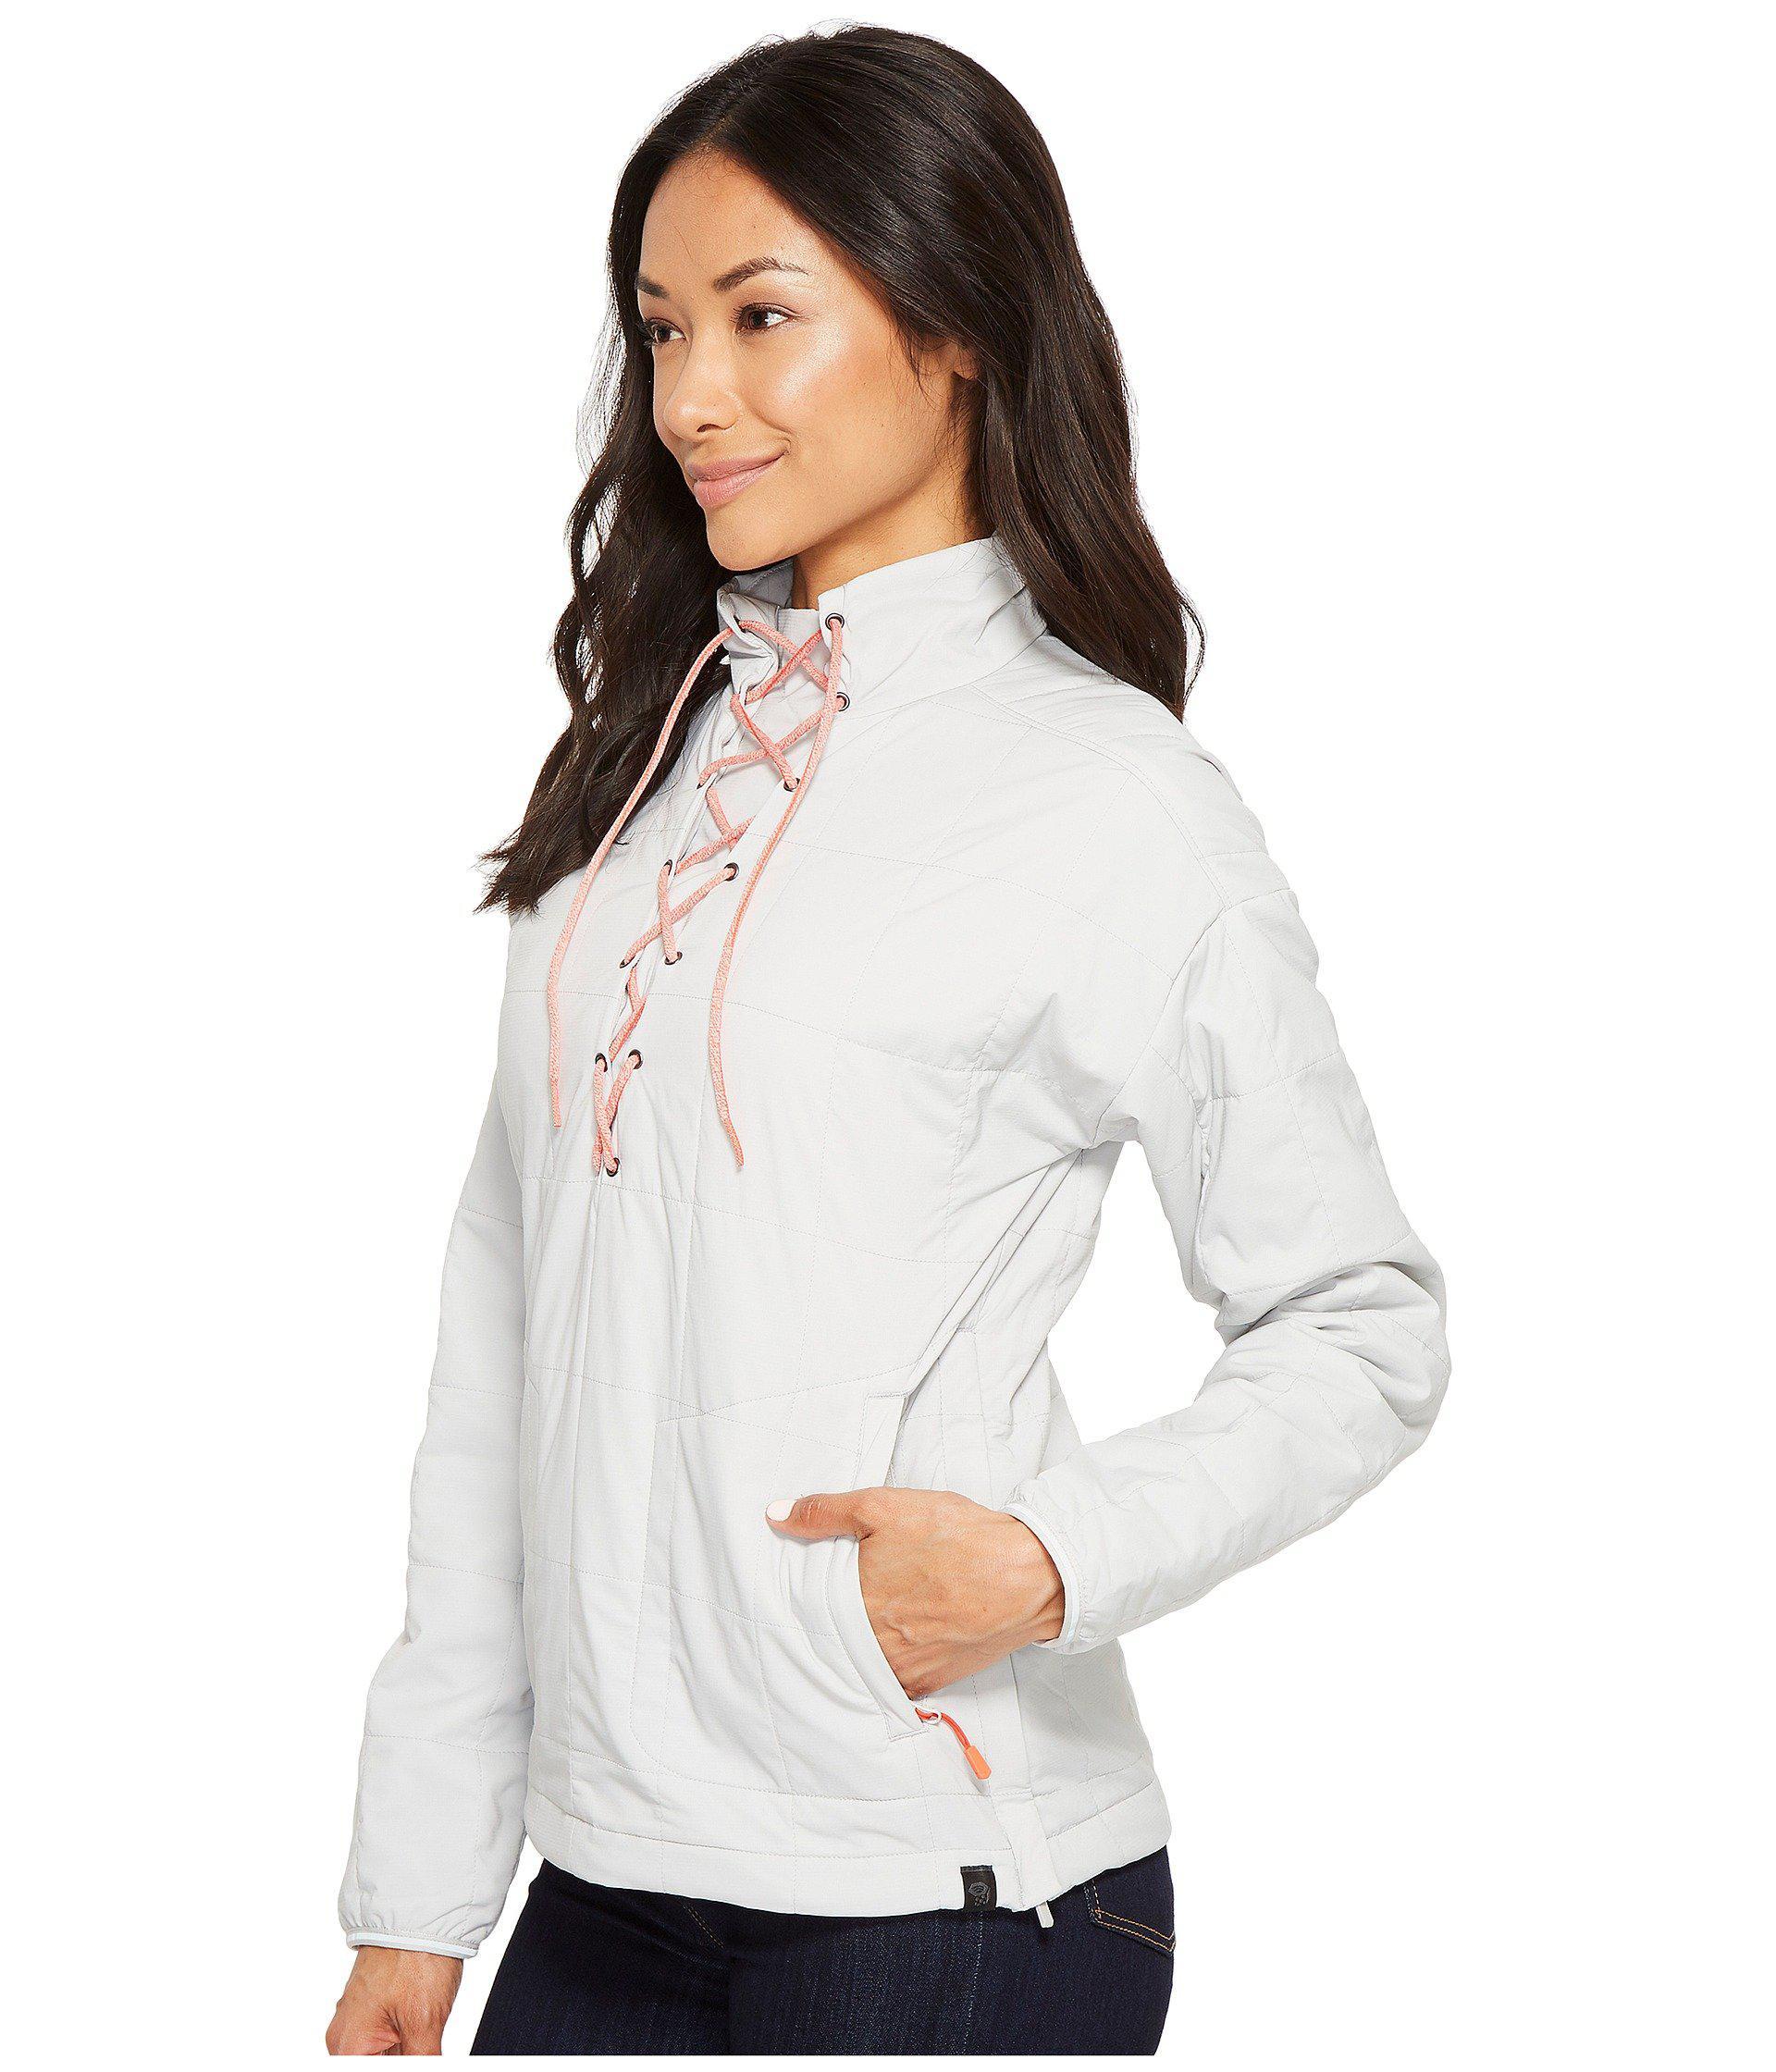 Mountain Hardwear Womens Escape Insulated Pullover